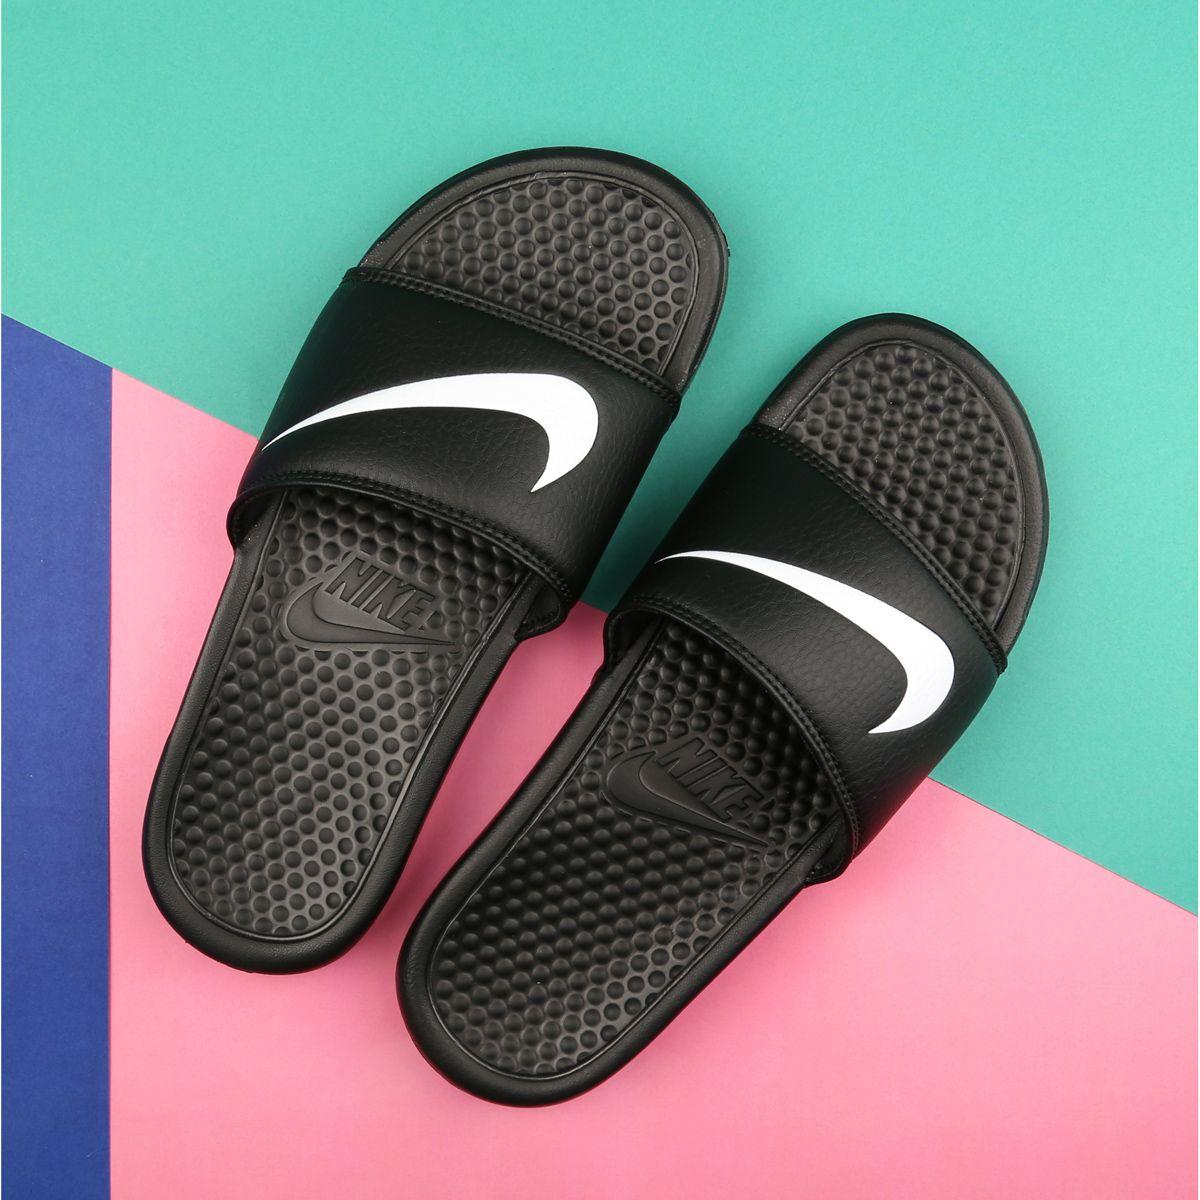 Livraison gratuite eastbay tumblr Femmes Nike Benassi Glisse Swoosh Nzz ensoleillement F8VG3